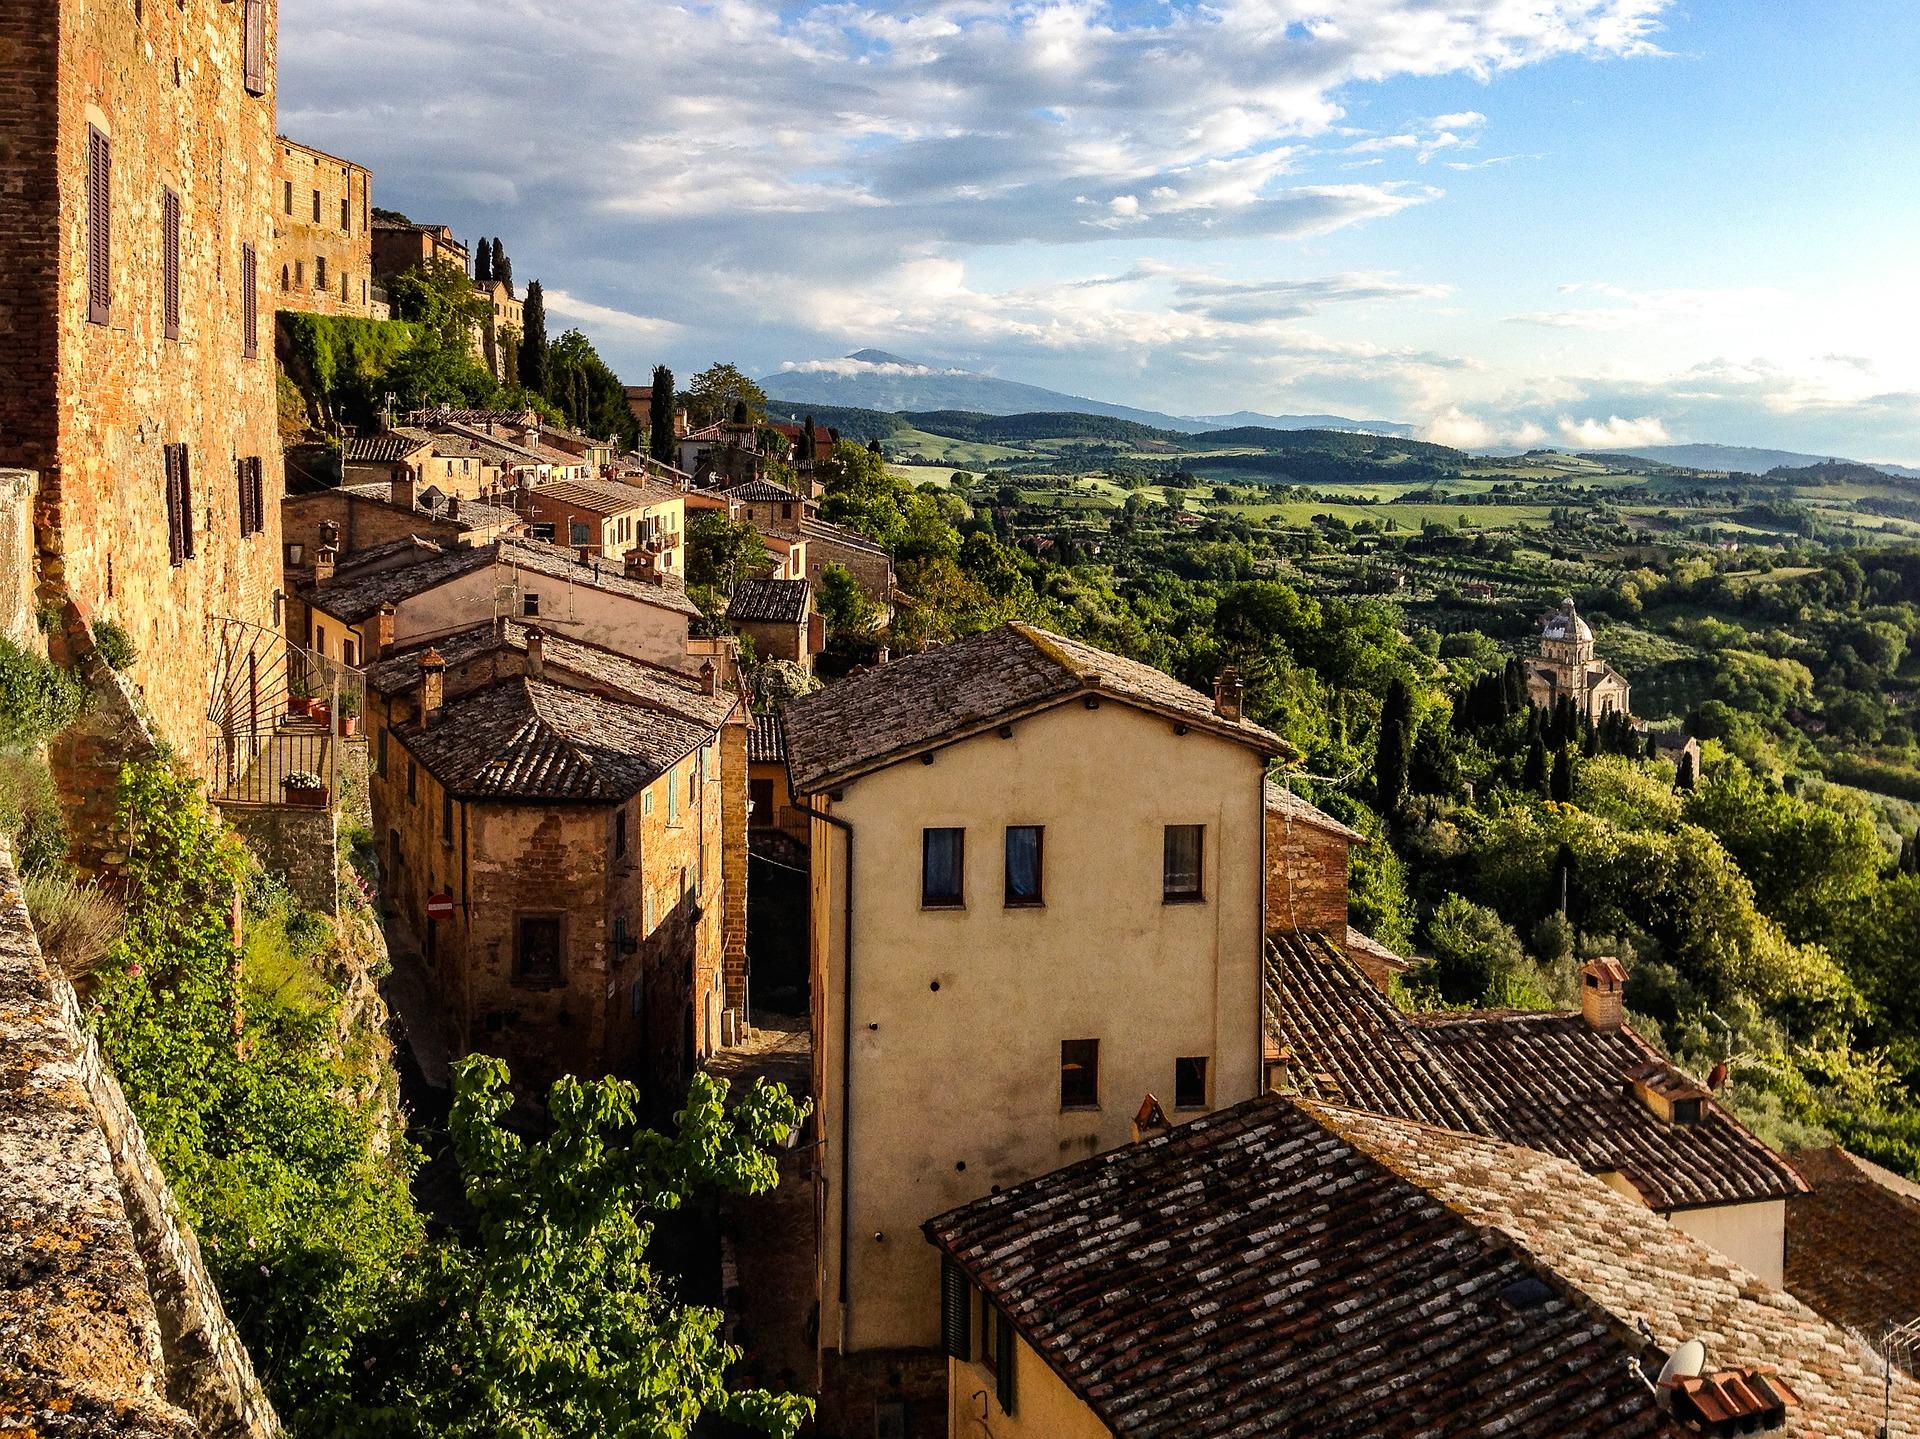 Tuscany, italymindfulness MEDITATION & yoga retreat - MAY 2019